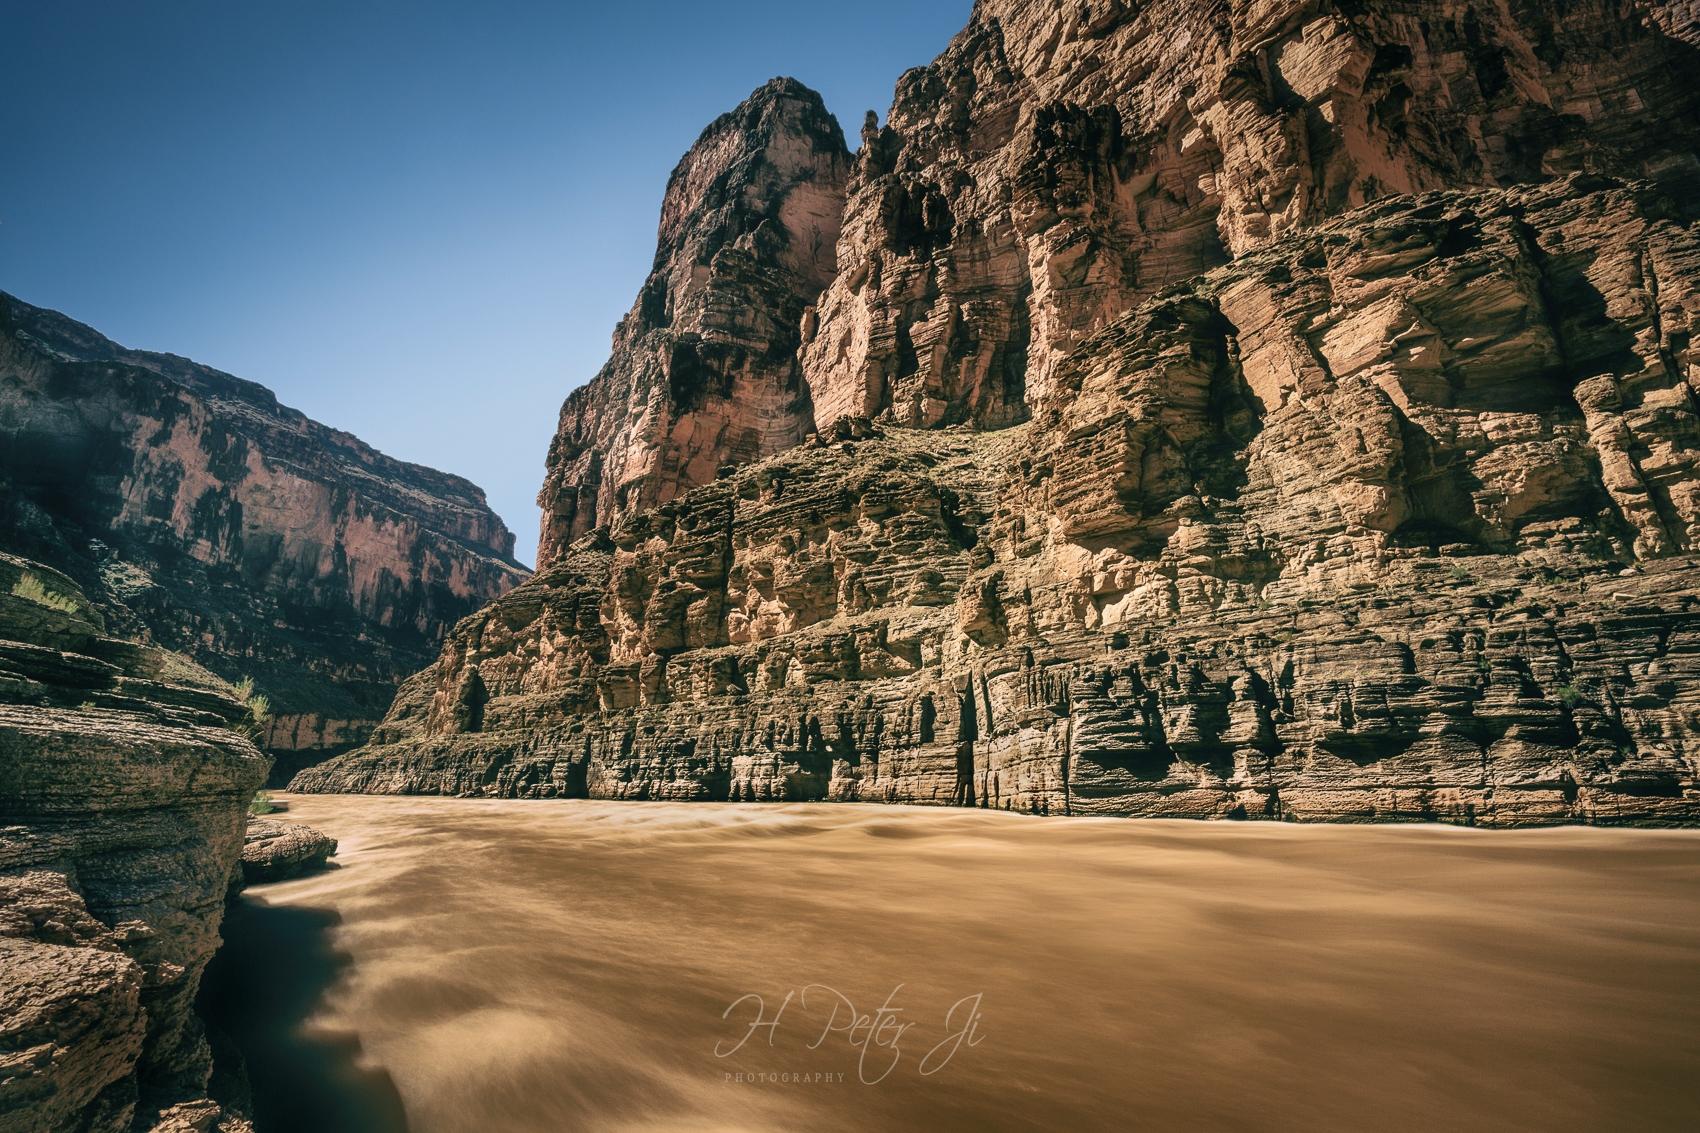 Enormity erosion body water cau - scorpioonsup | ello